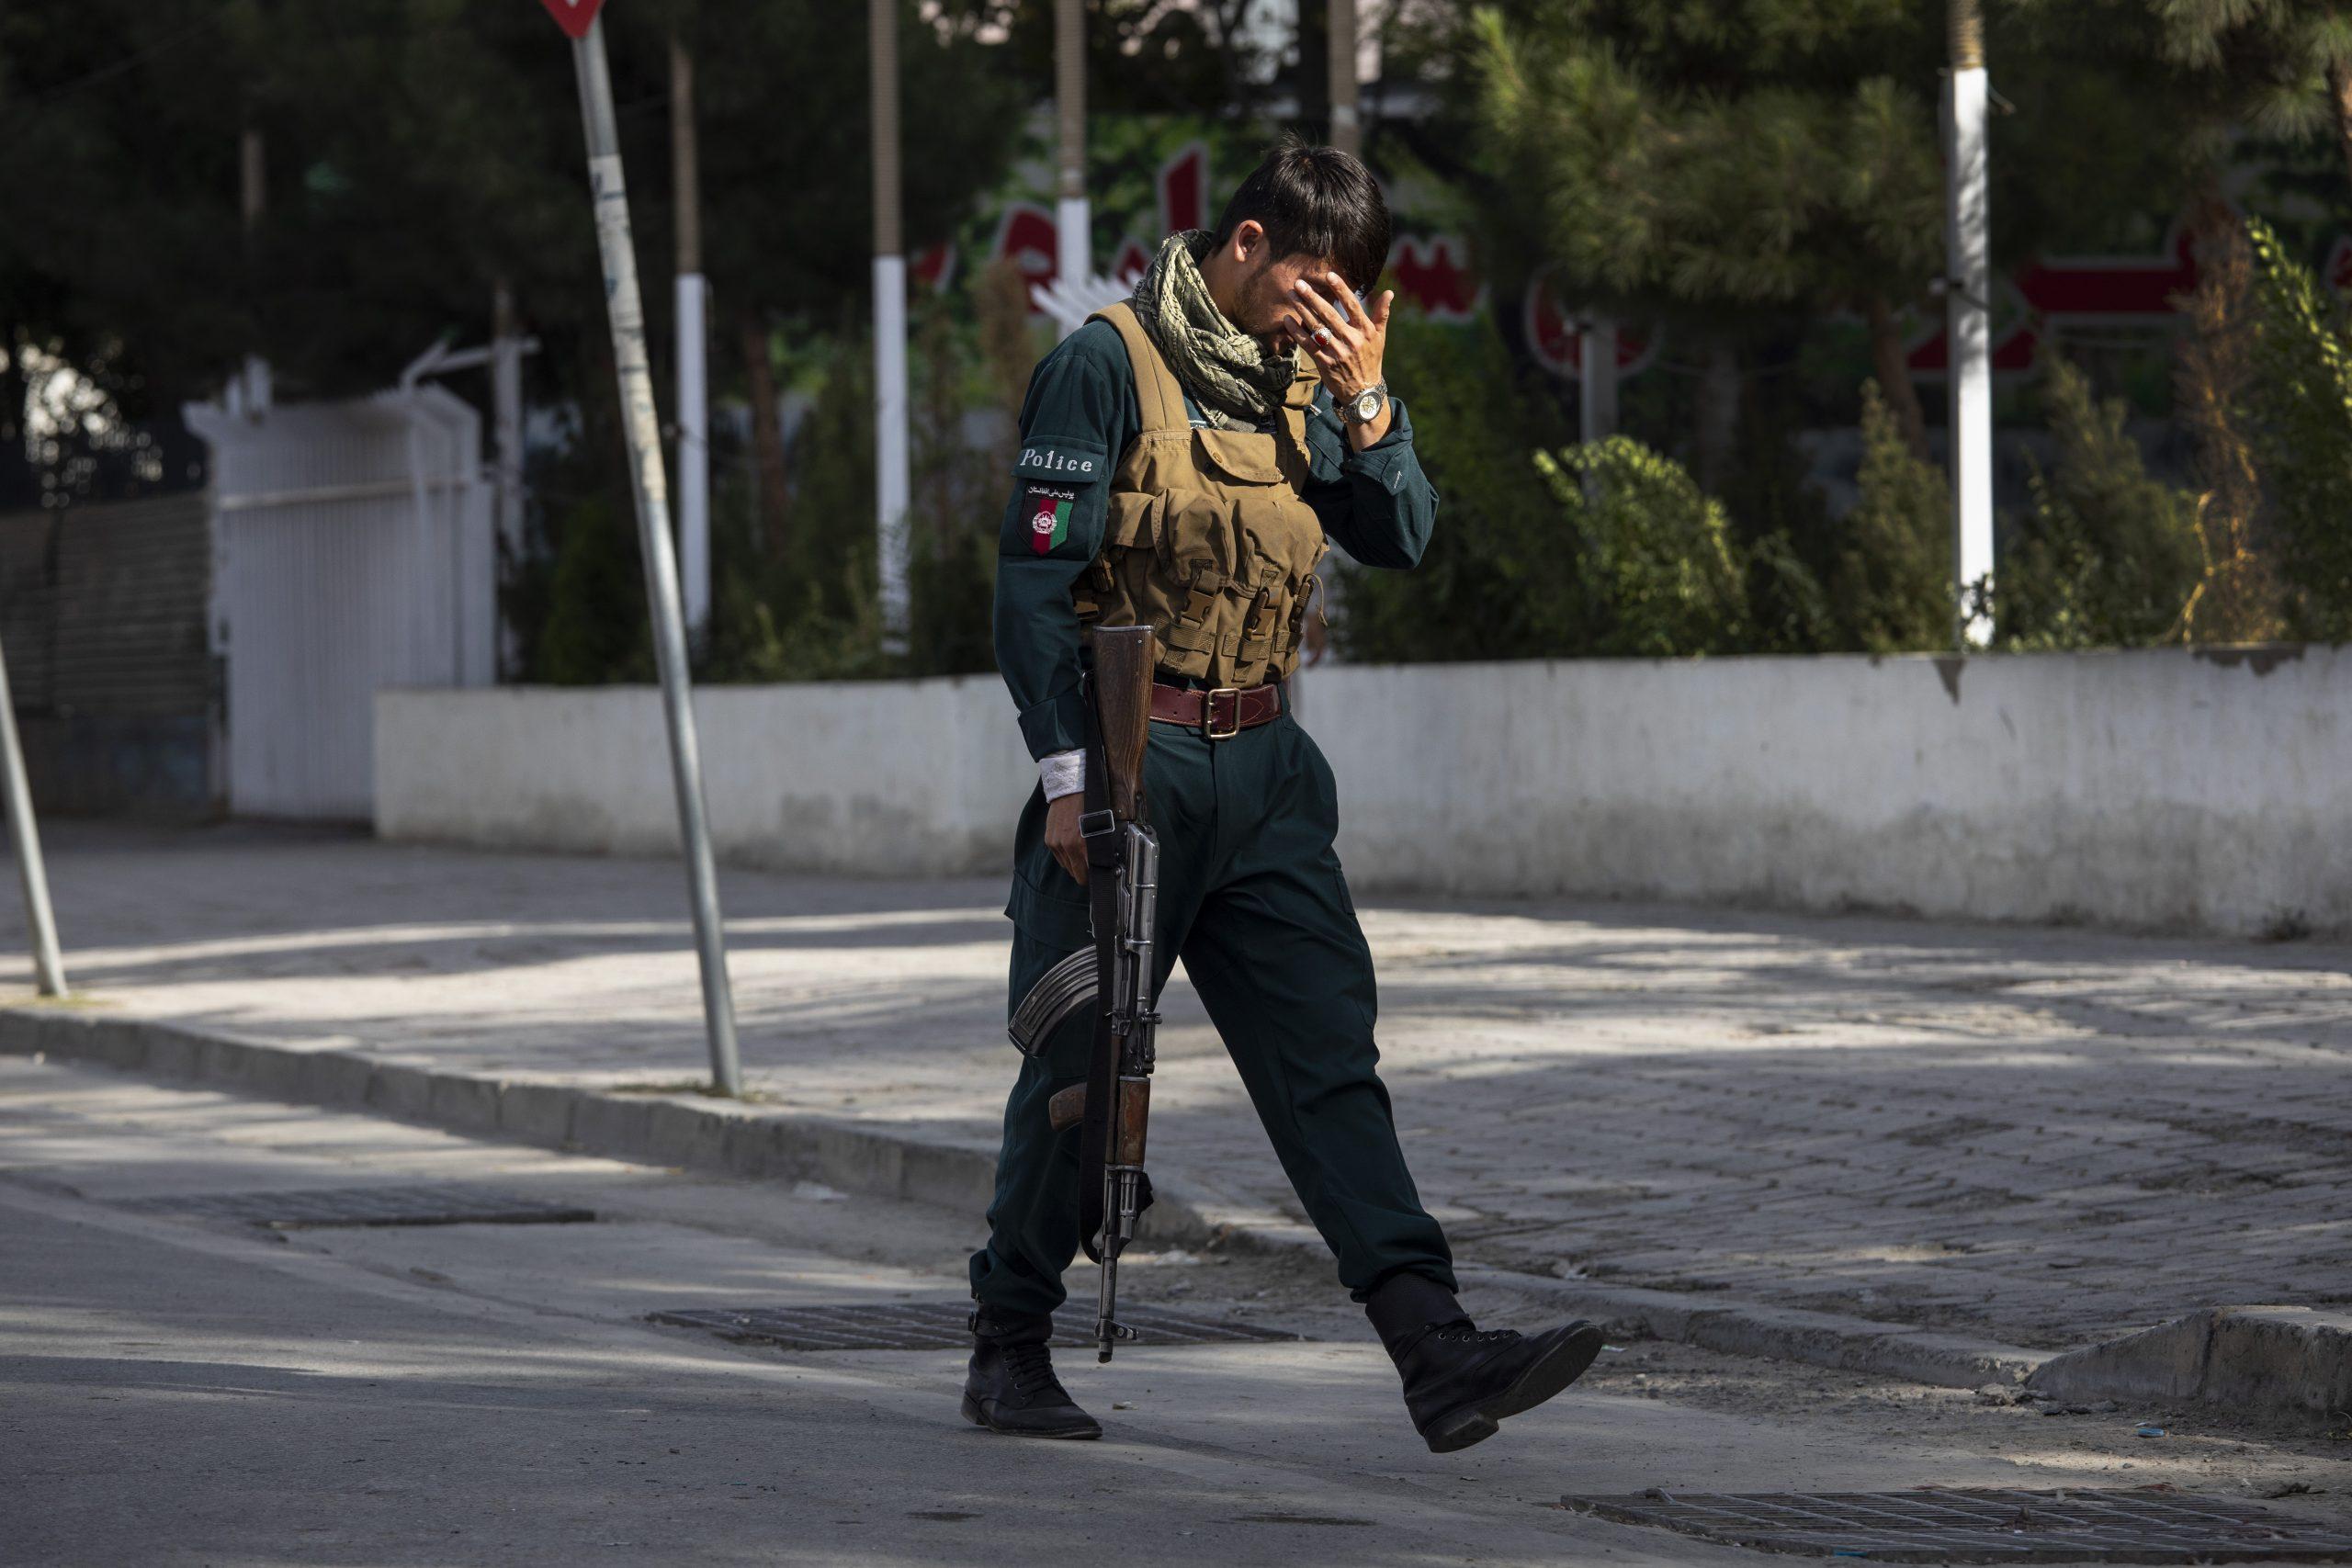 Kabul vor dem Fall an die radikalislamischen Taliban